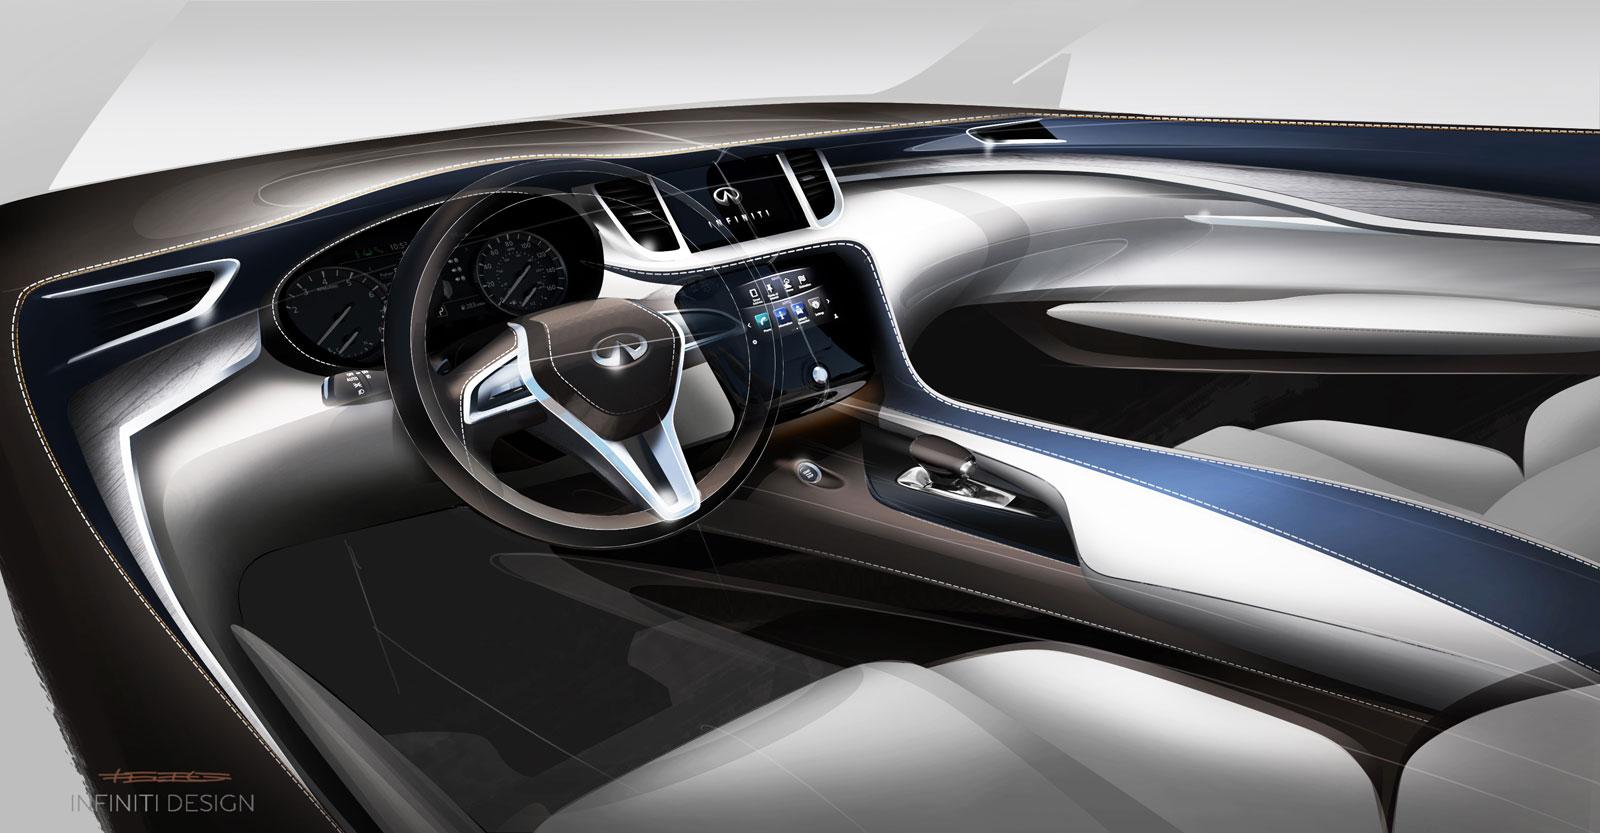 2019 Infiniti Qx50 Interior Design Sketch Car Body Design